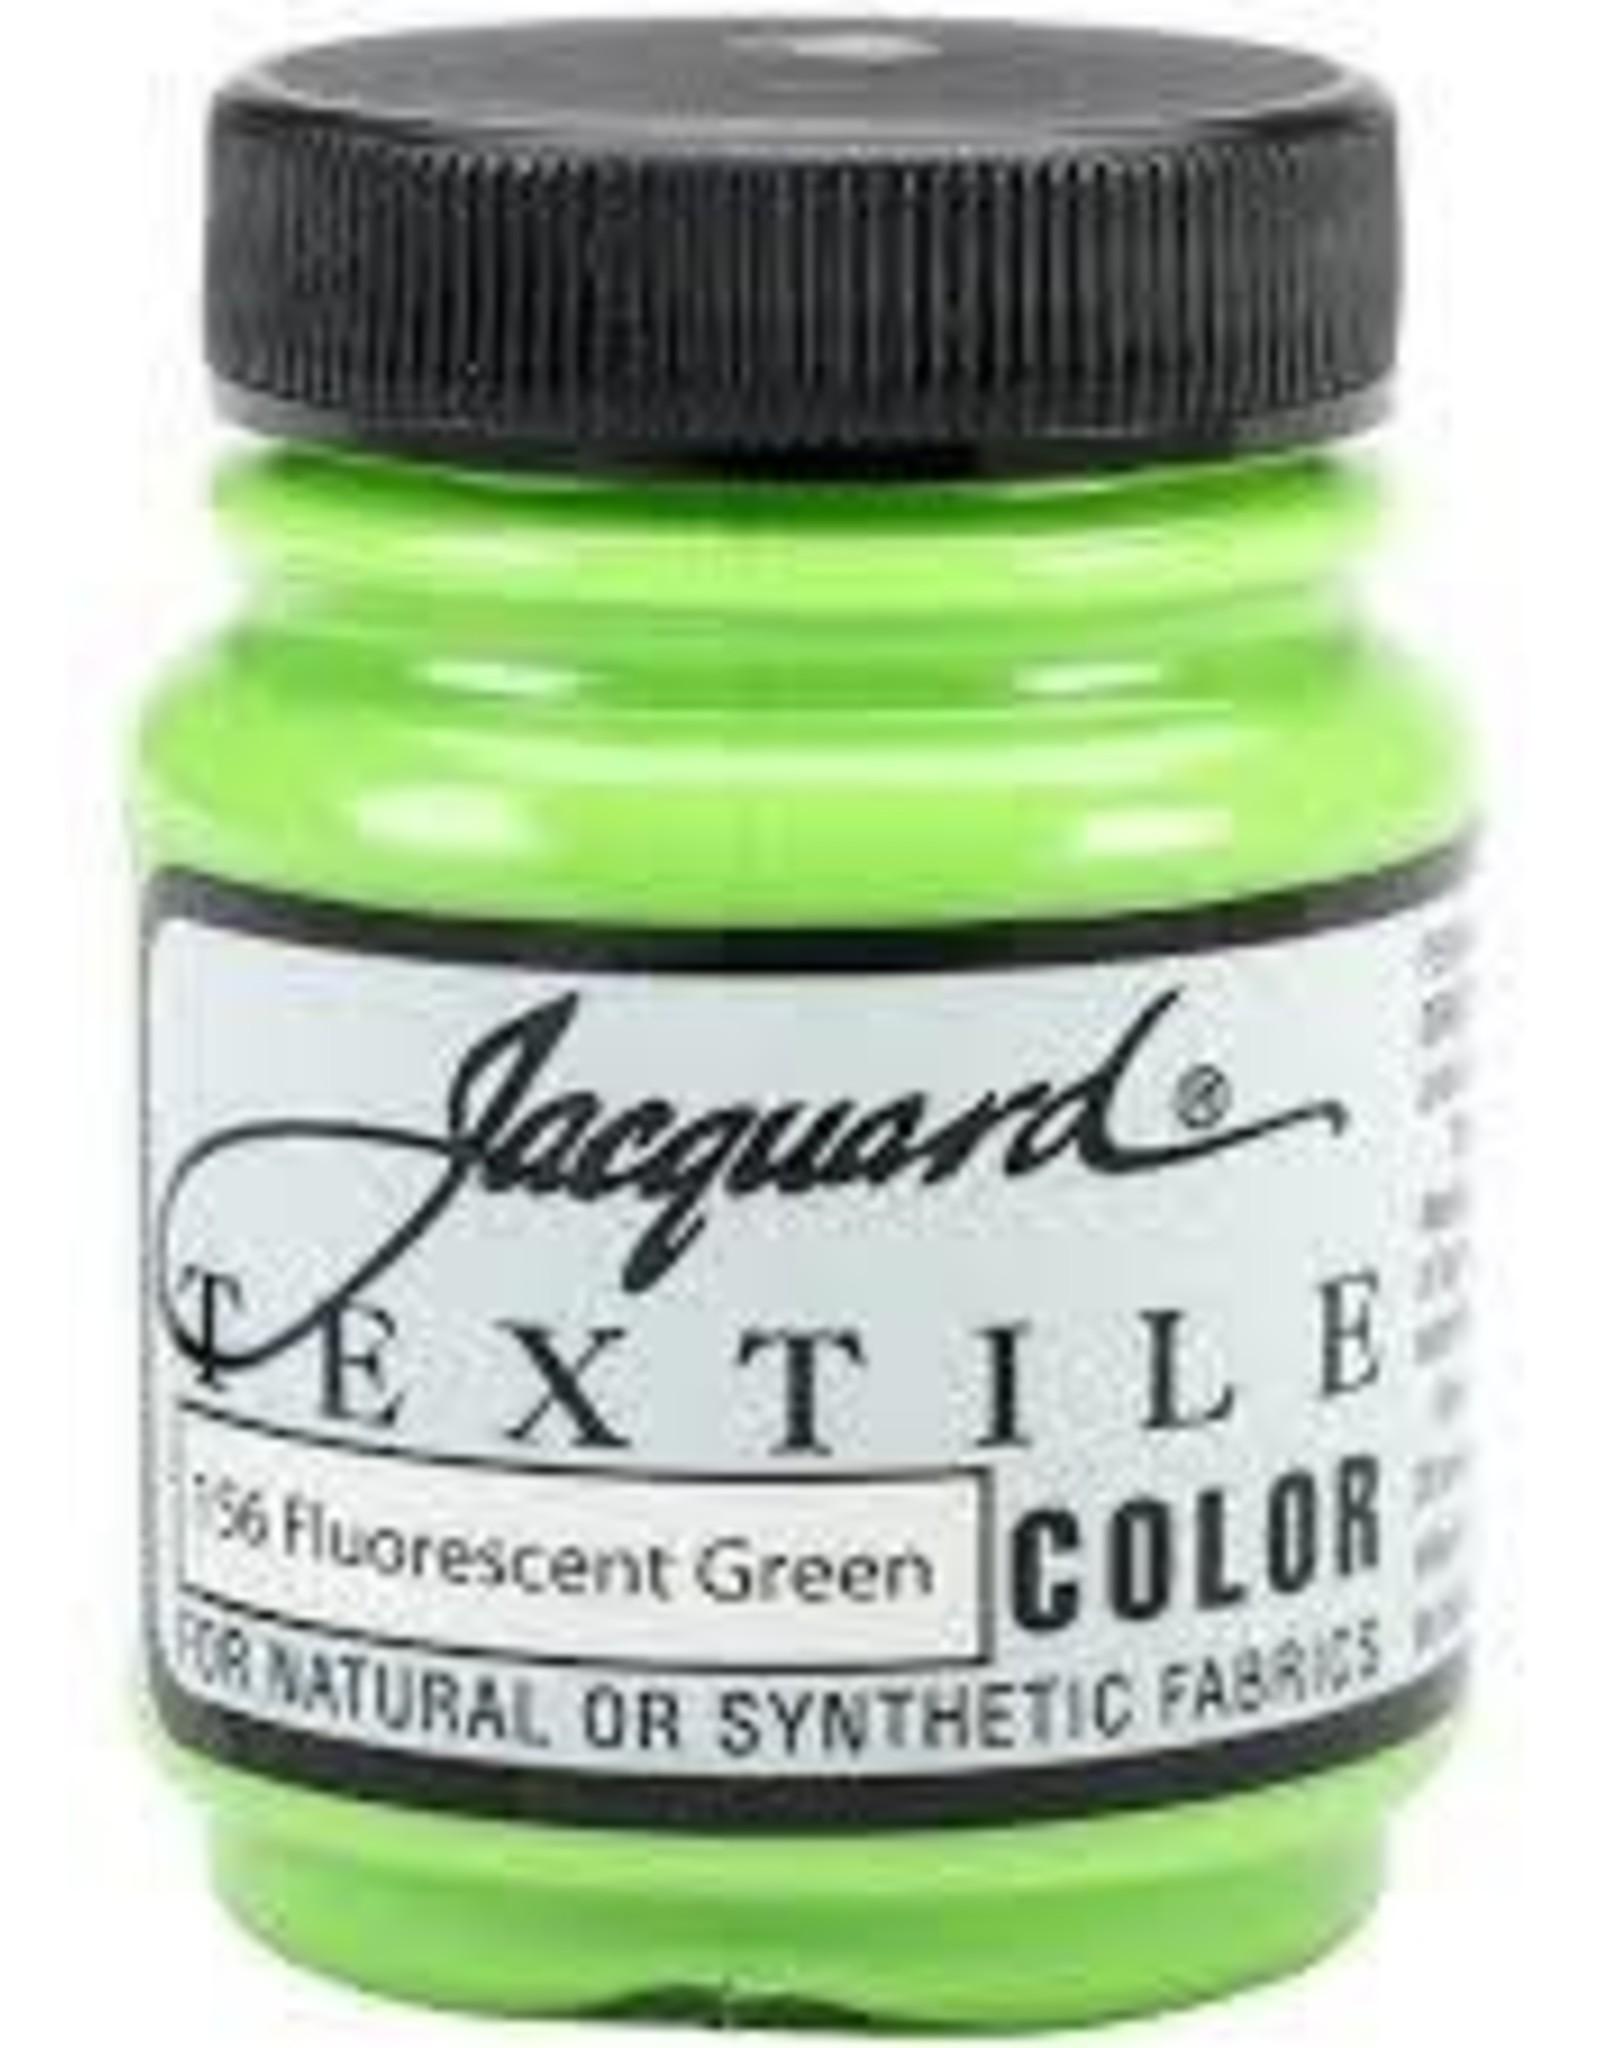 Jacquard Textile Color Fluorescent Green